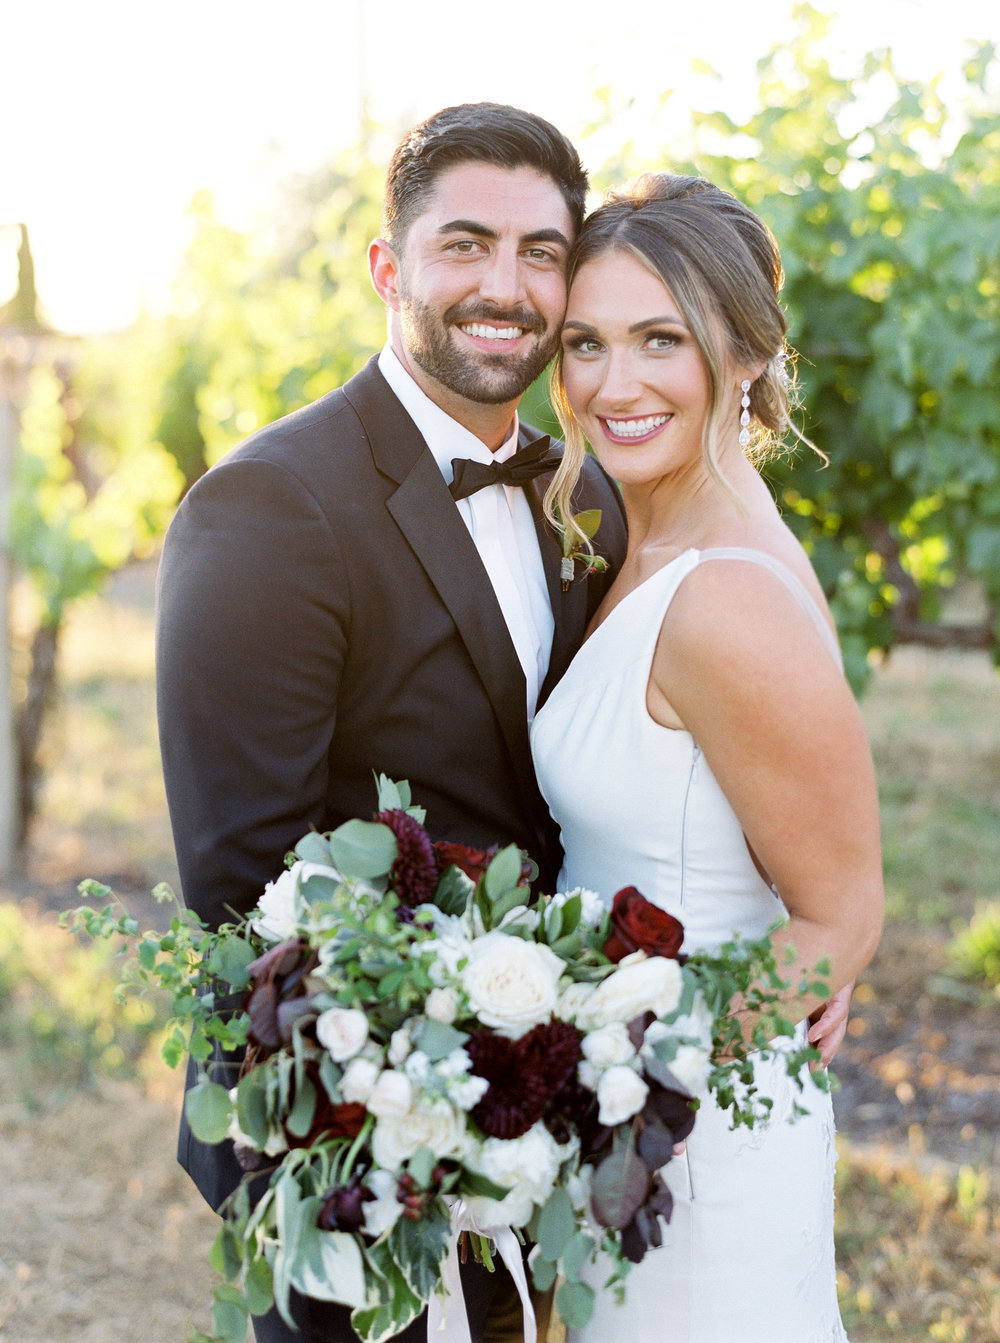 vintners-inn-wedding-in-santa-rosa-california-161.jpg